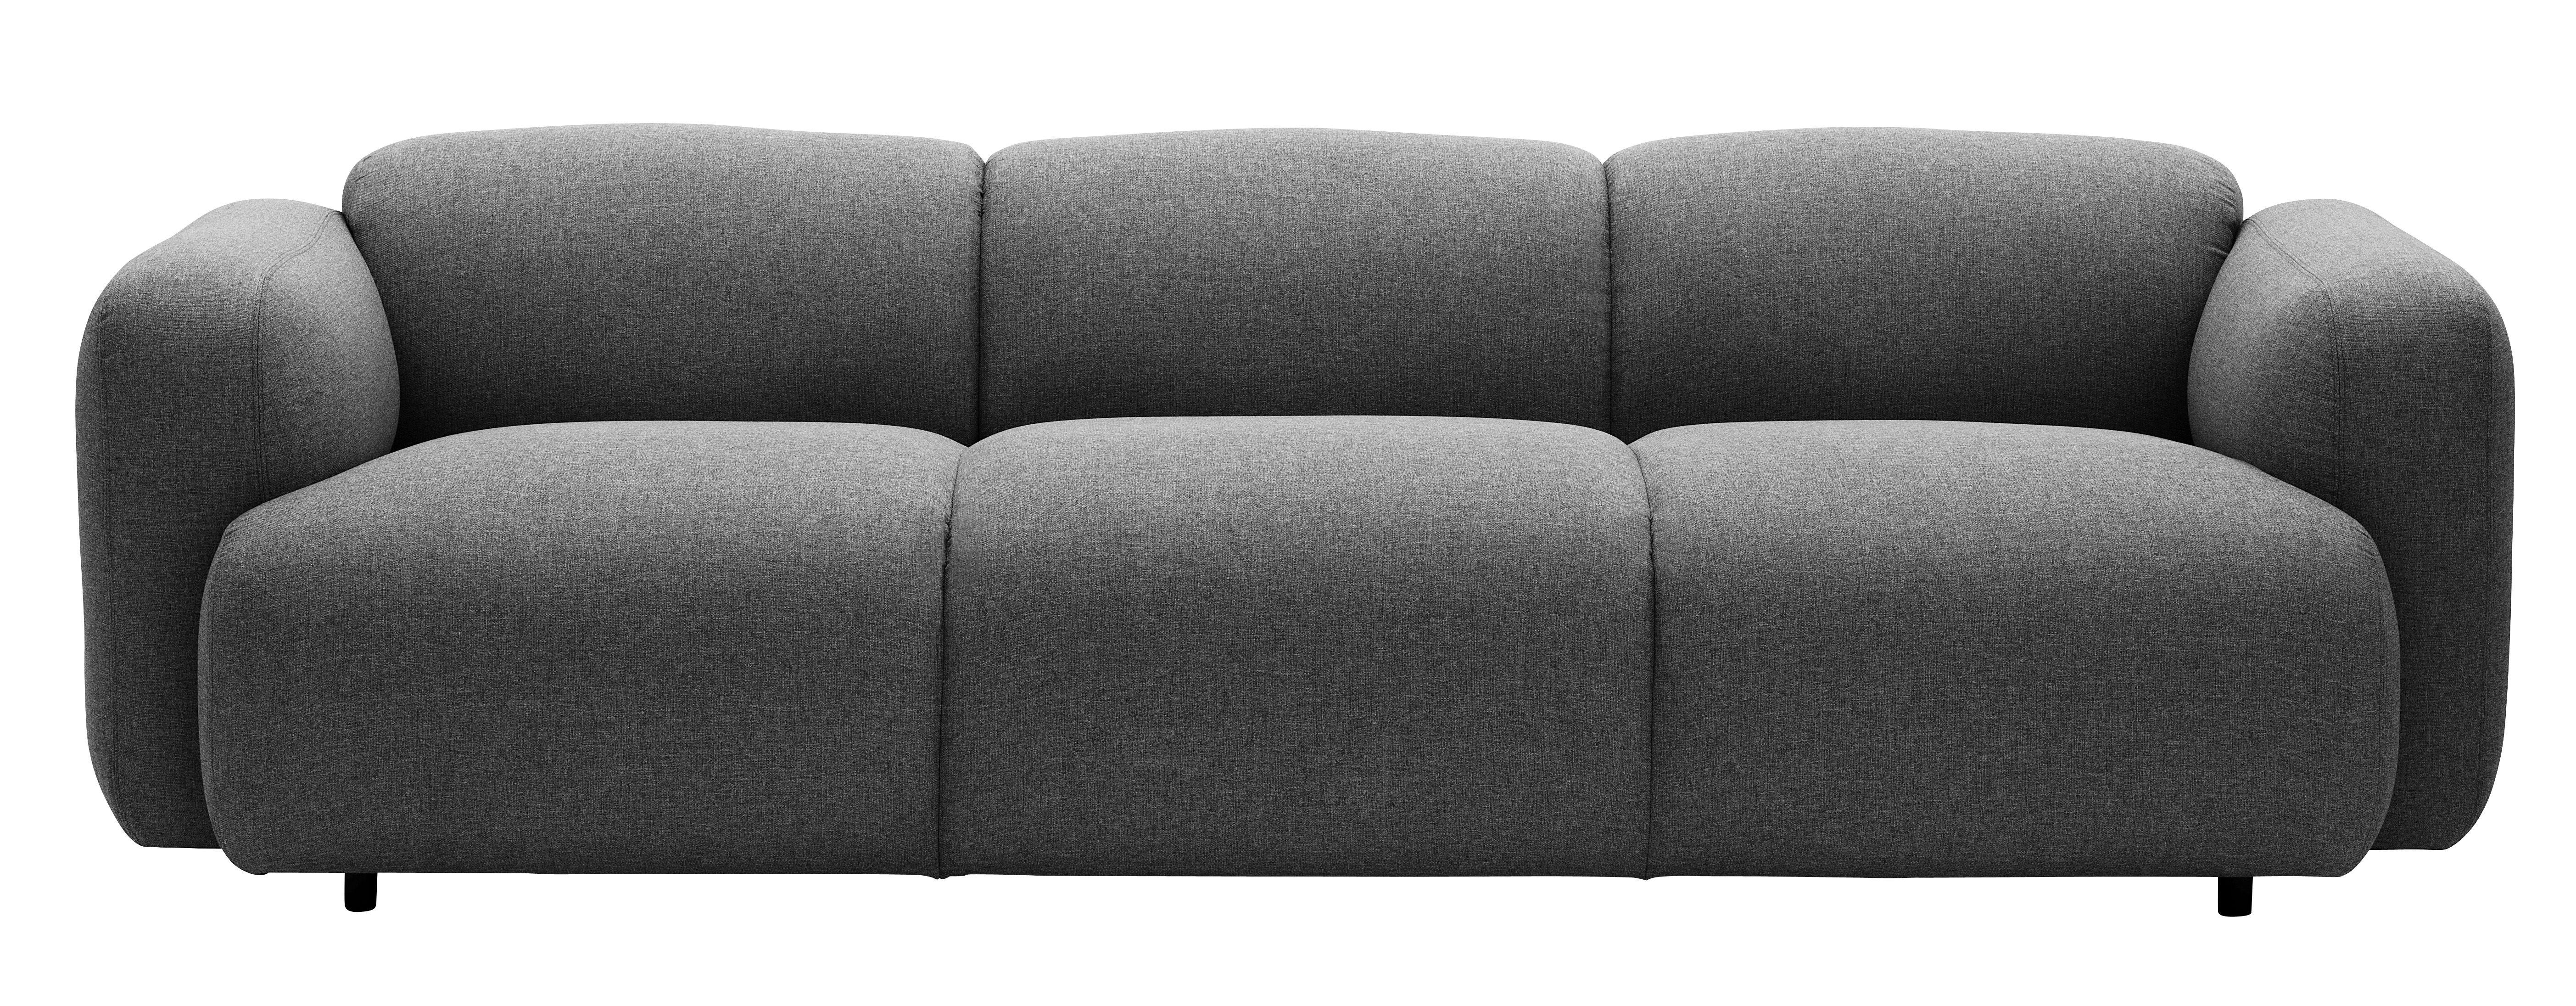 Möbel - Sofas - Swell Sofa / L 235 cm - 3-Sitzer - Normann Copenhagen - Grau - Gewebe, Stahl